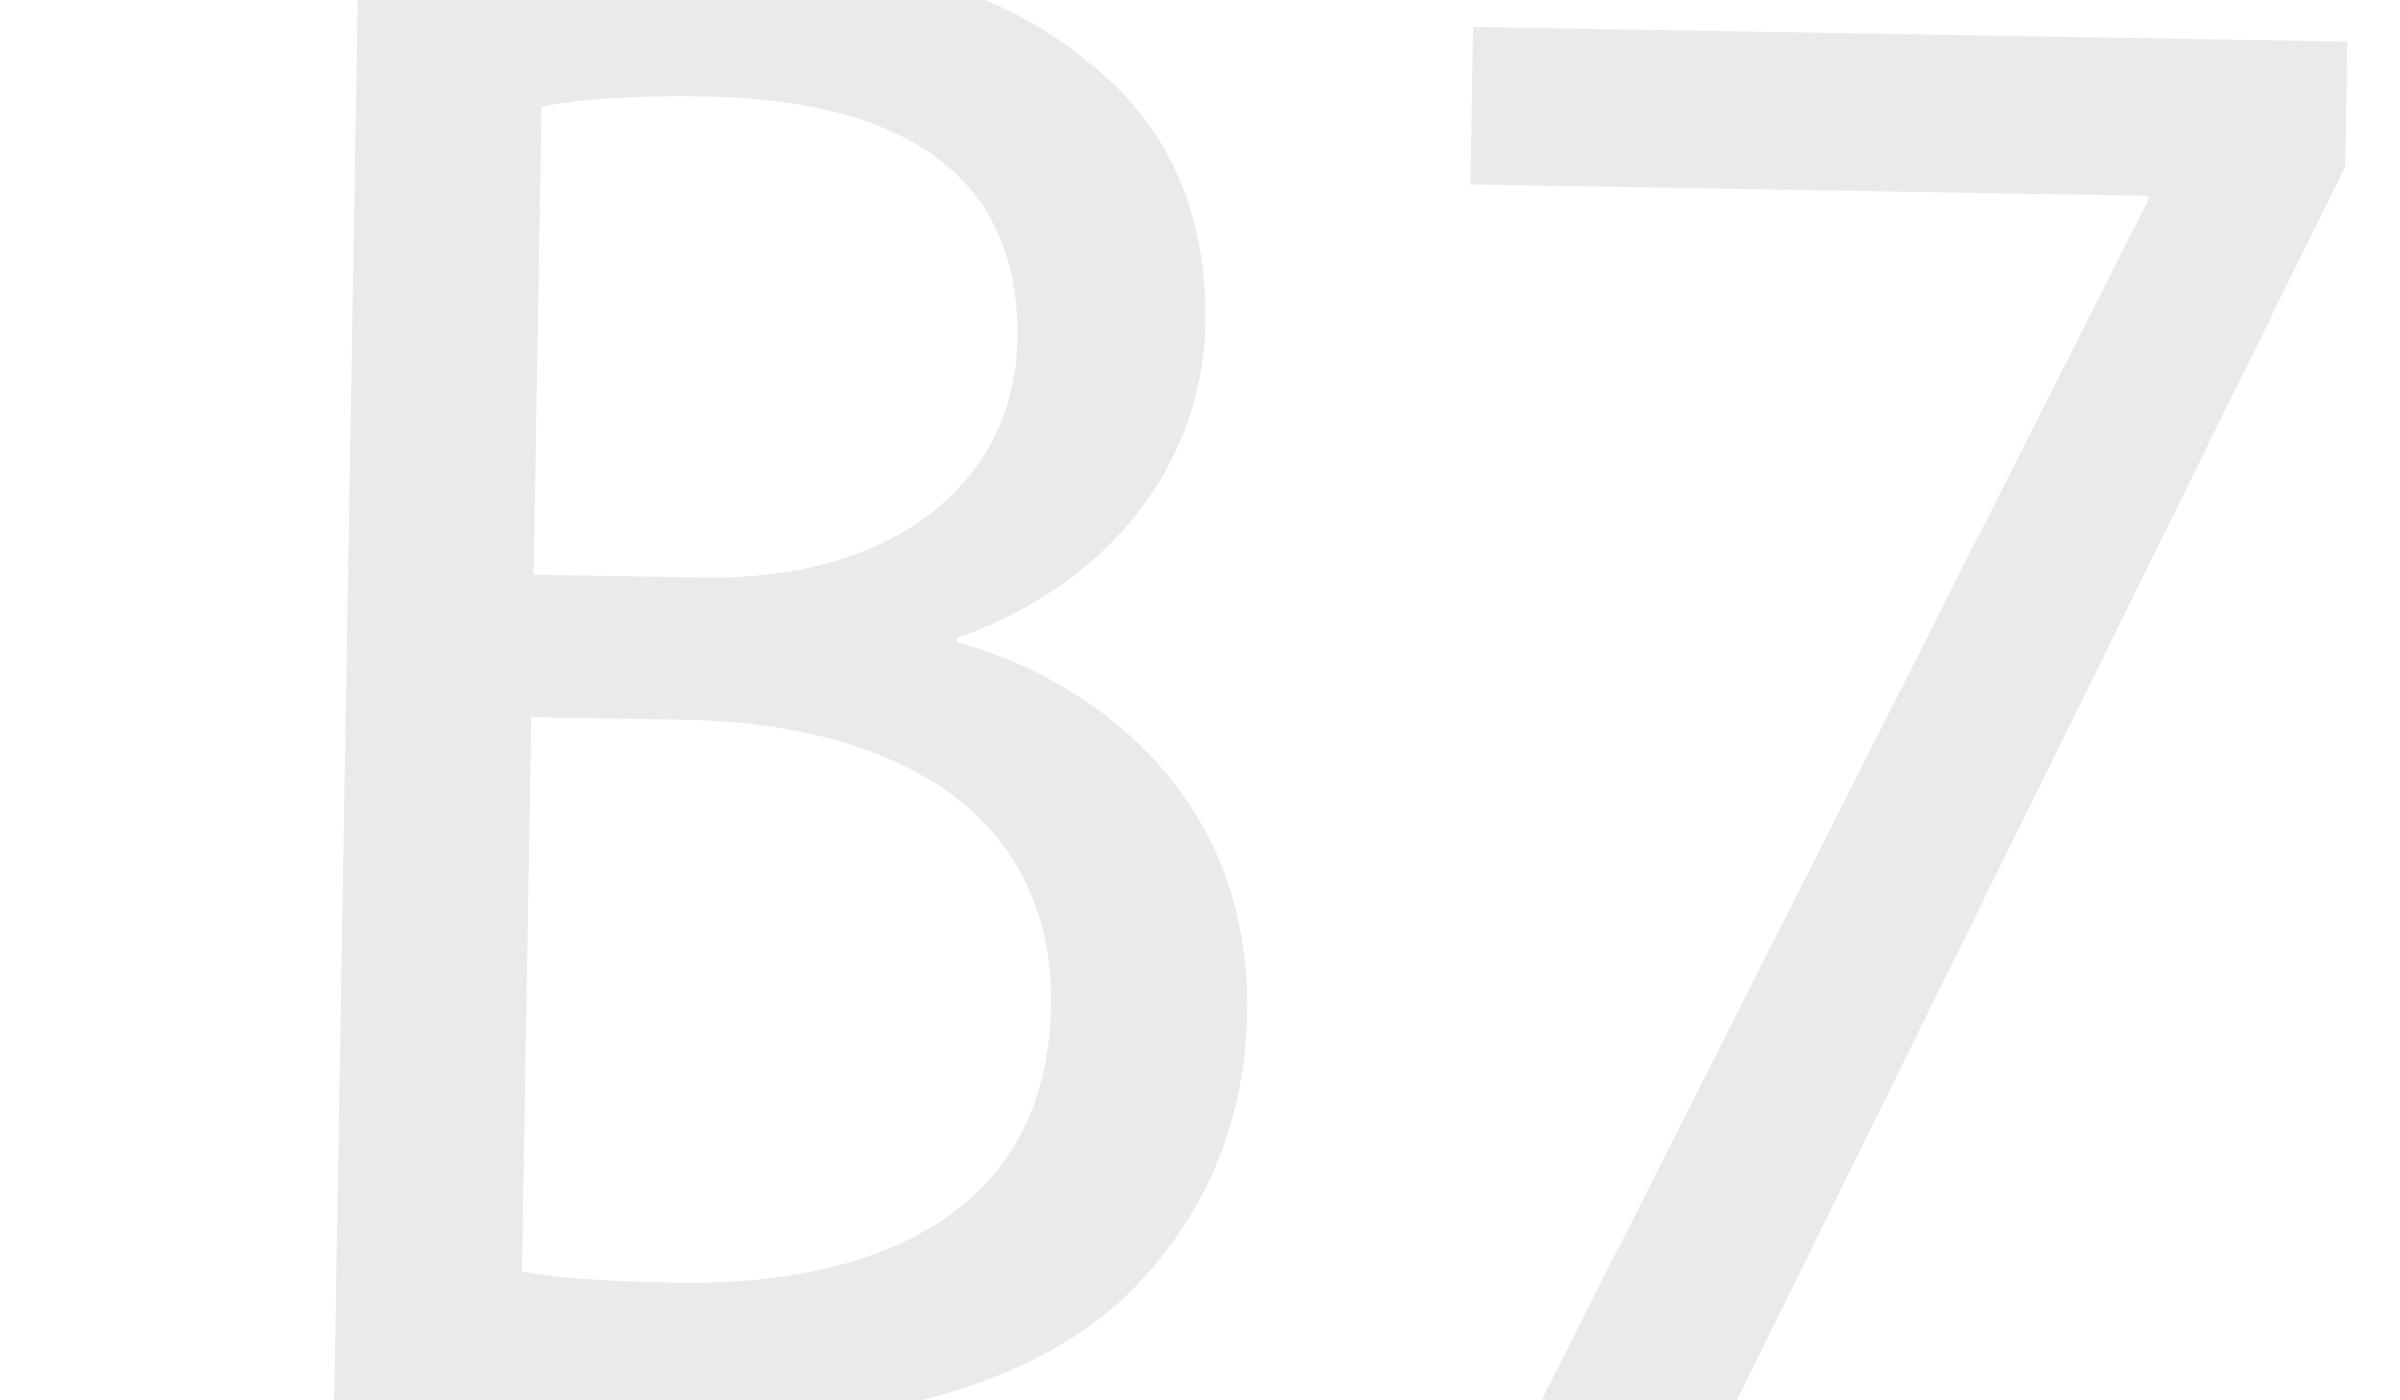 backb7